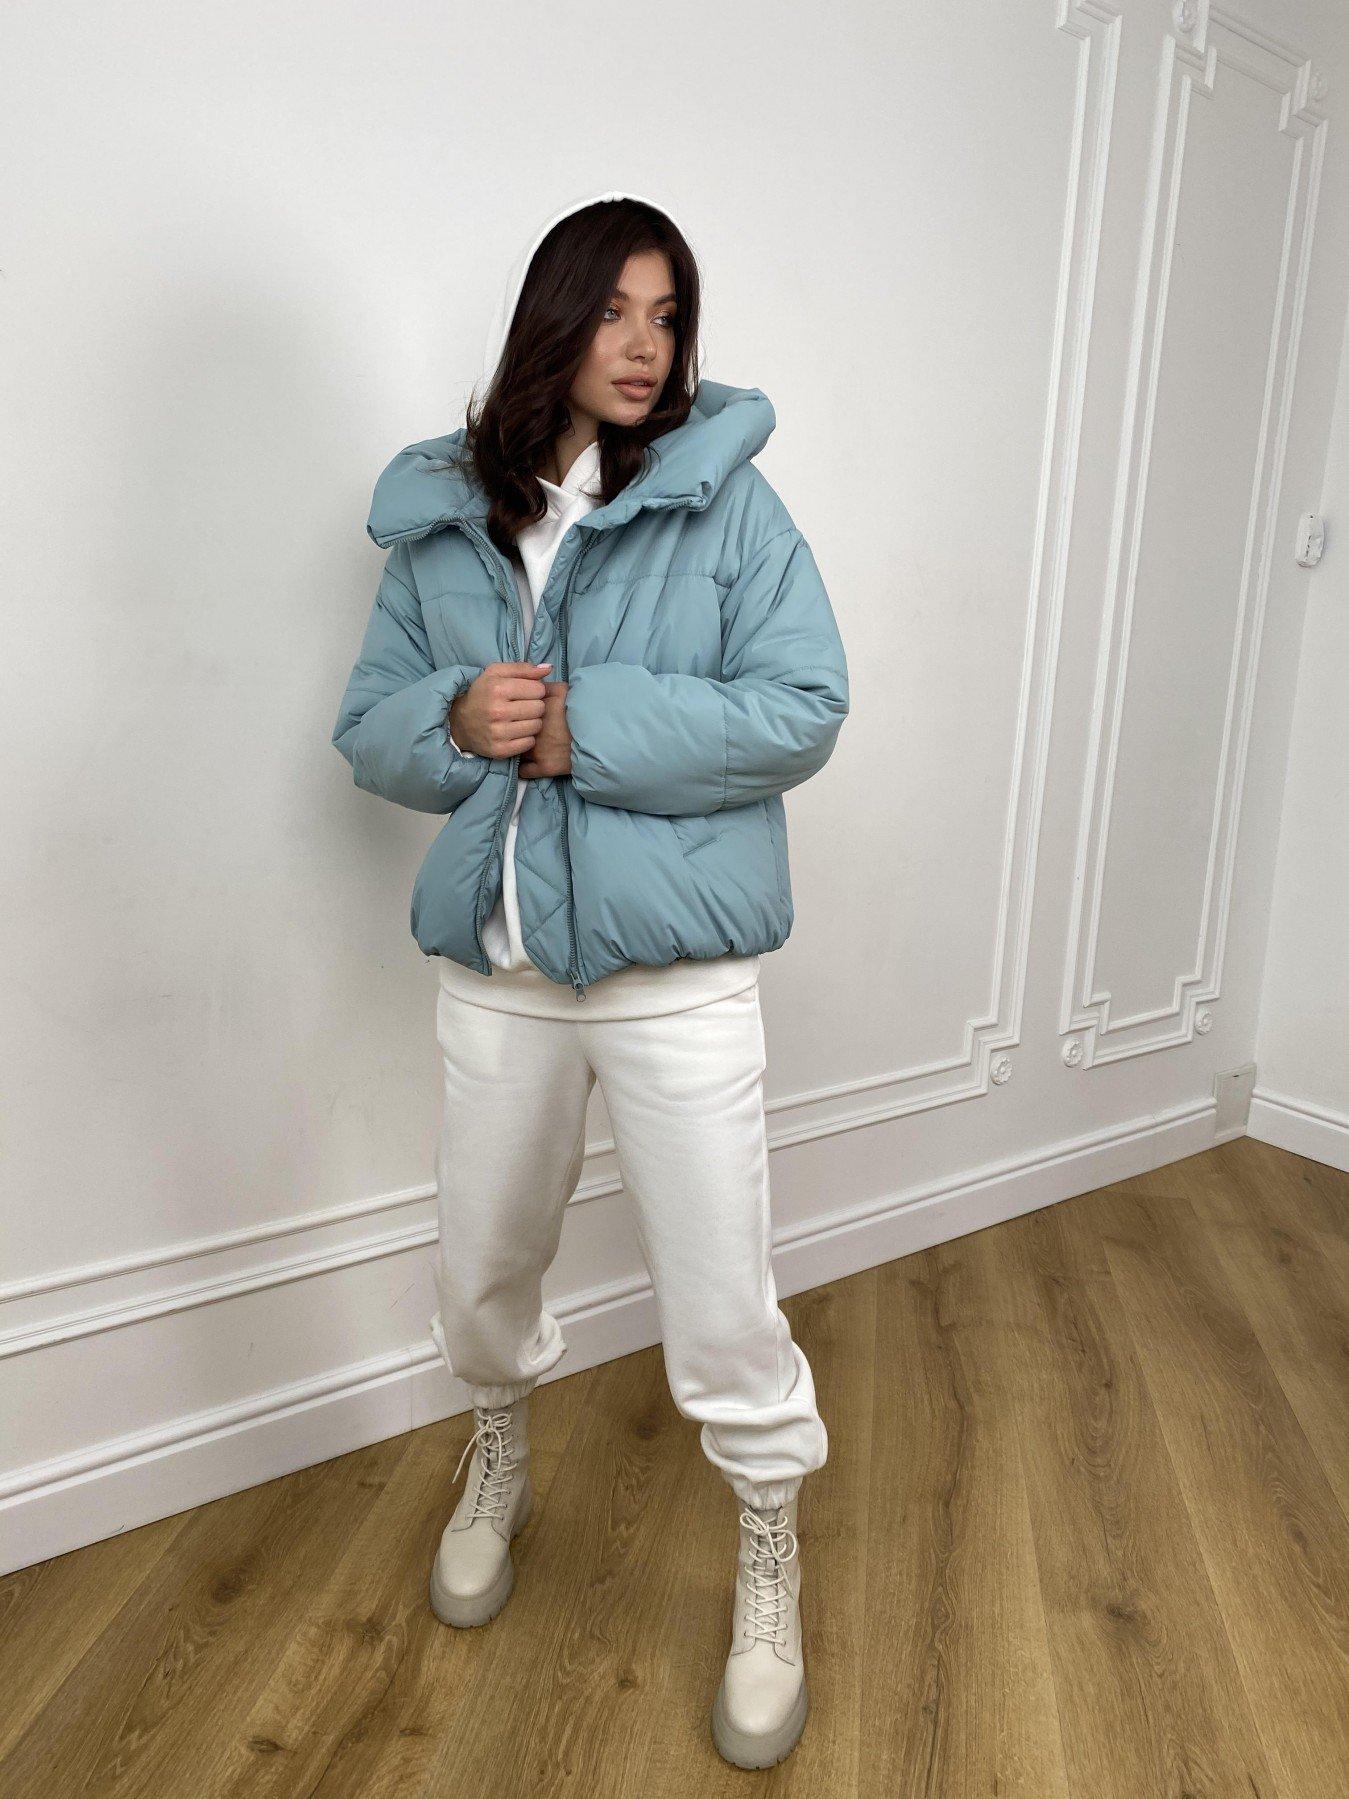 Нокс куртка  из плащевой ткани Astra 10994 АРТ. 47484 Цвет: Олива Astra - фото 2, интернет магазин tm-modus.ru